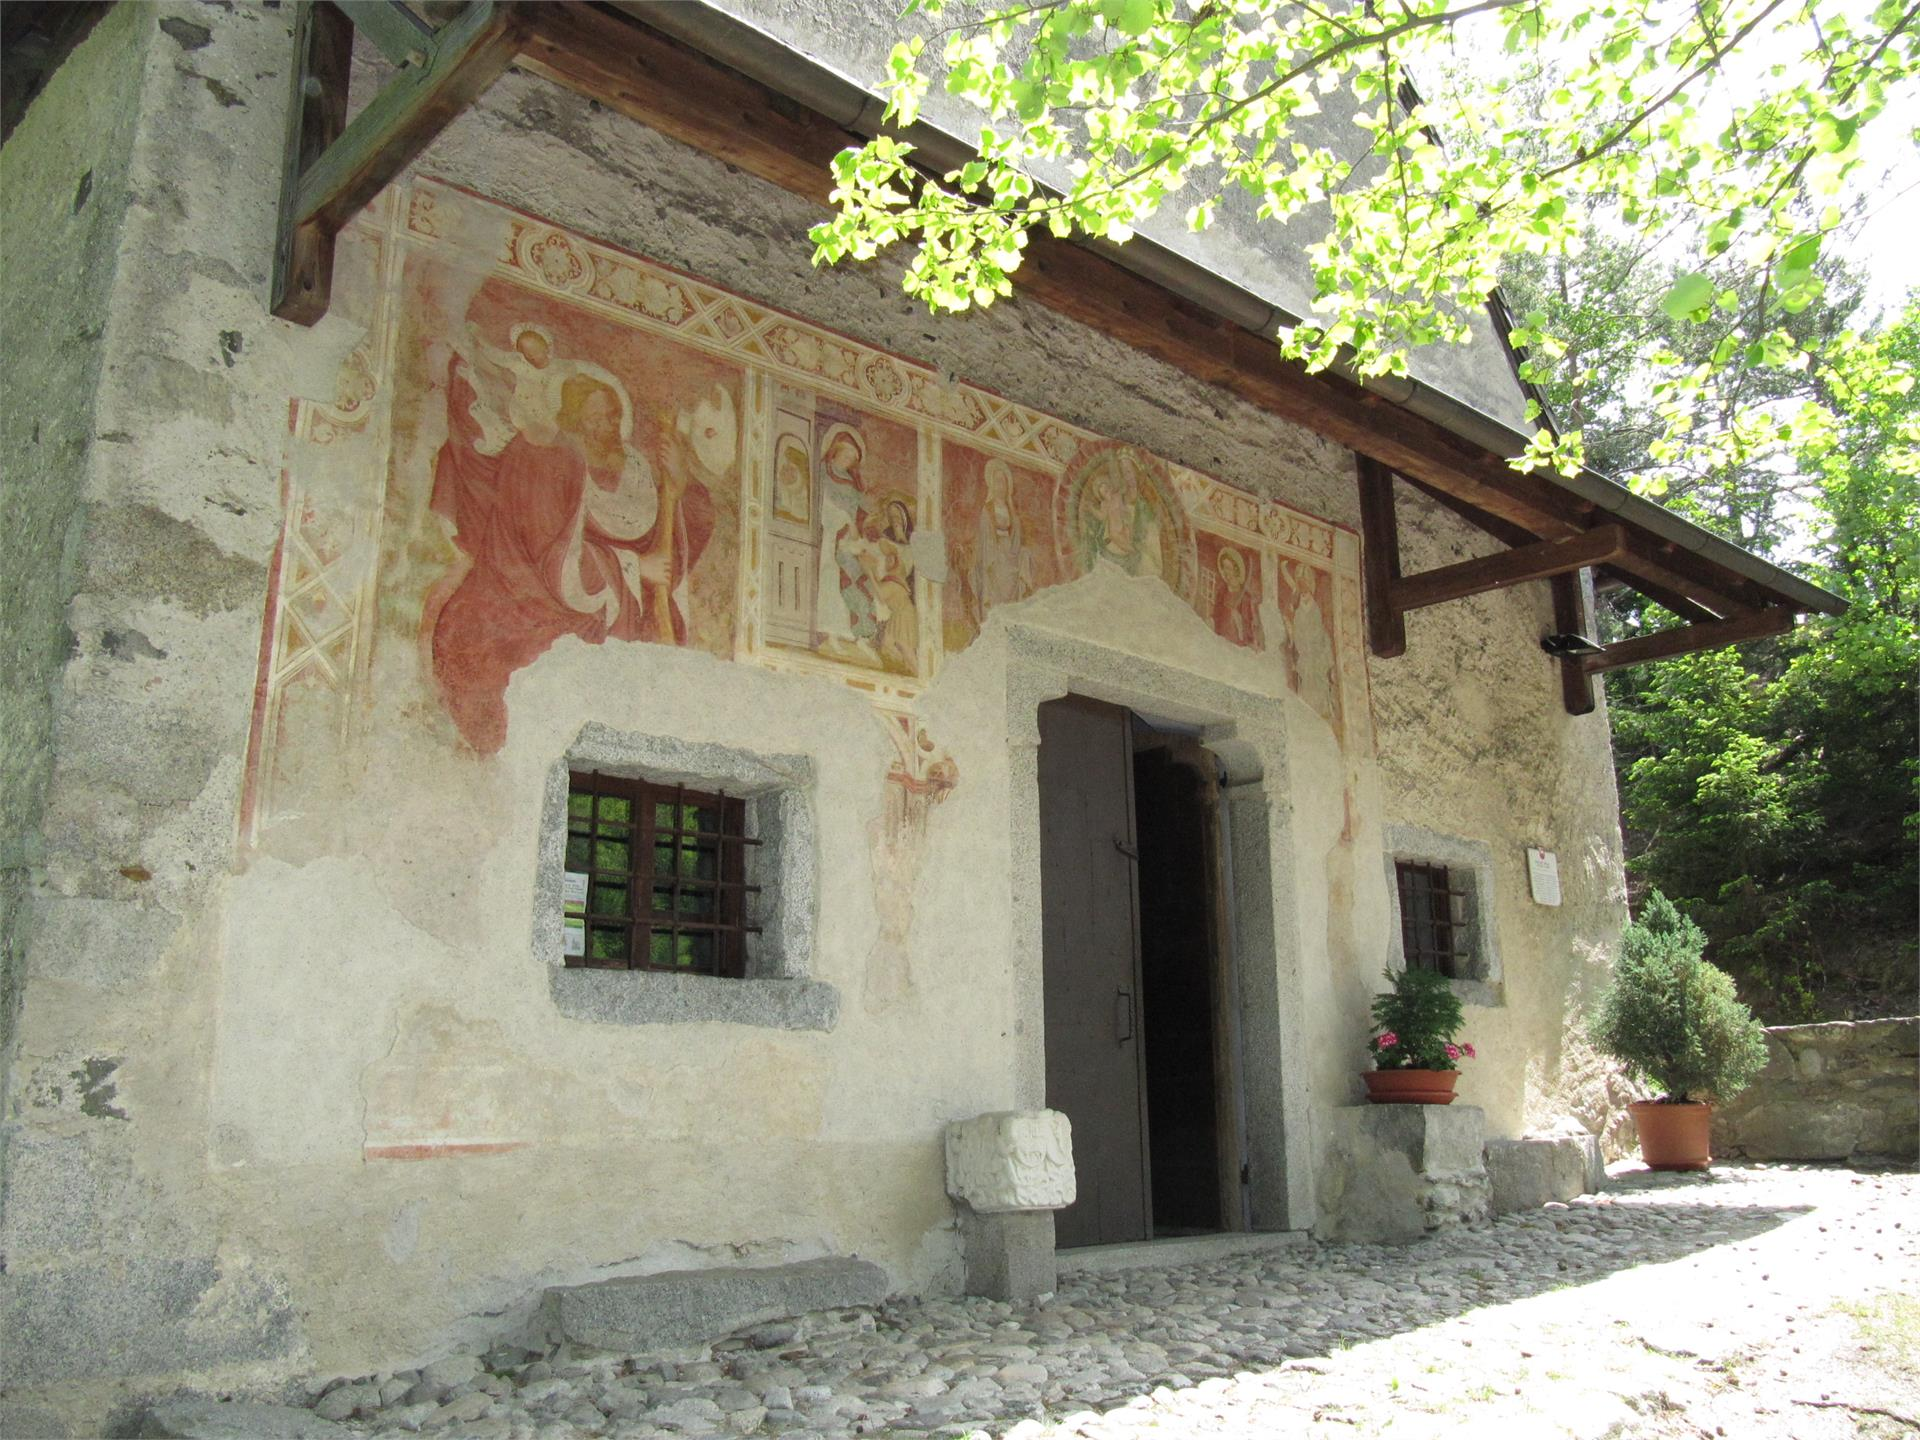 St. Cyrillus-Weg